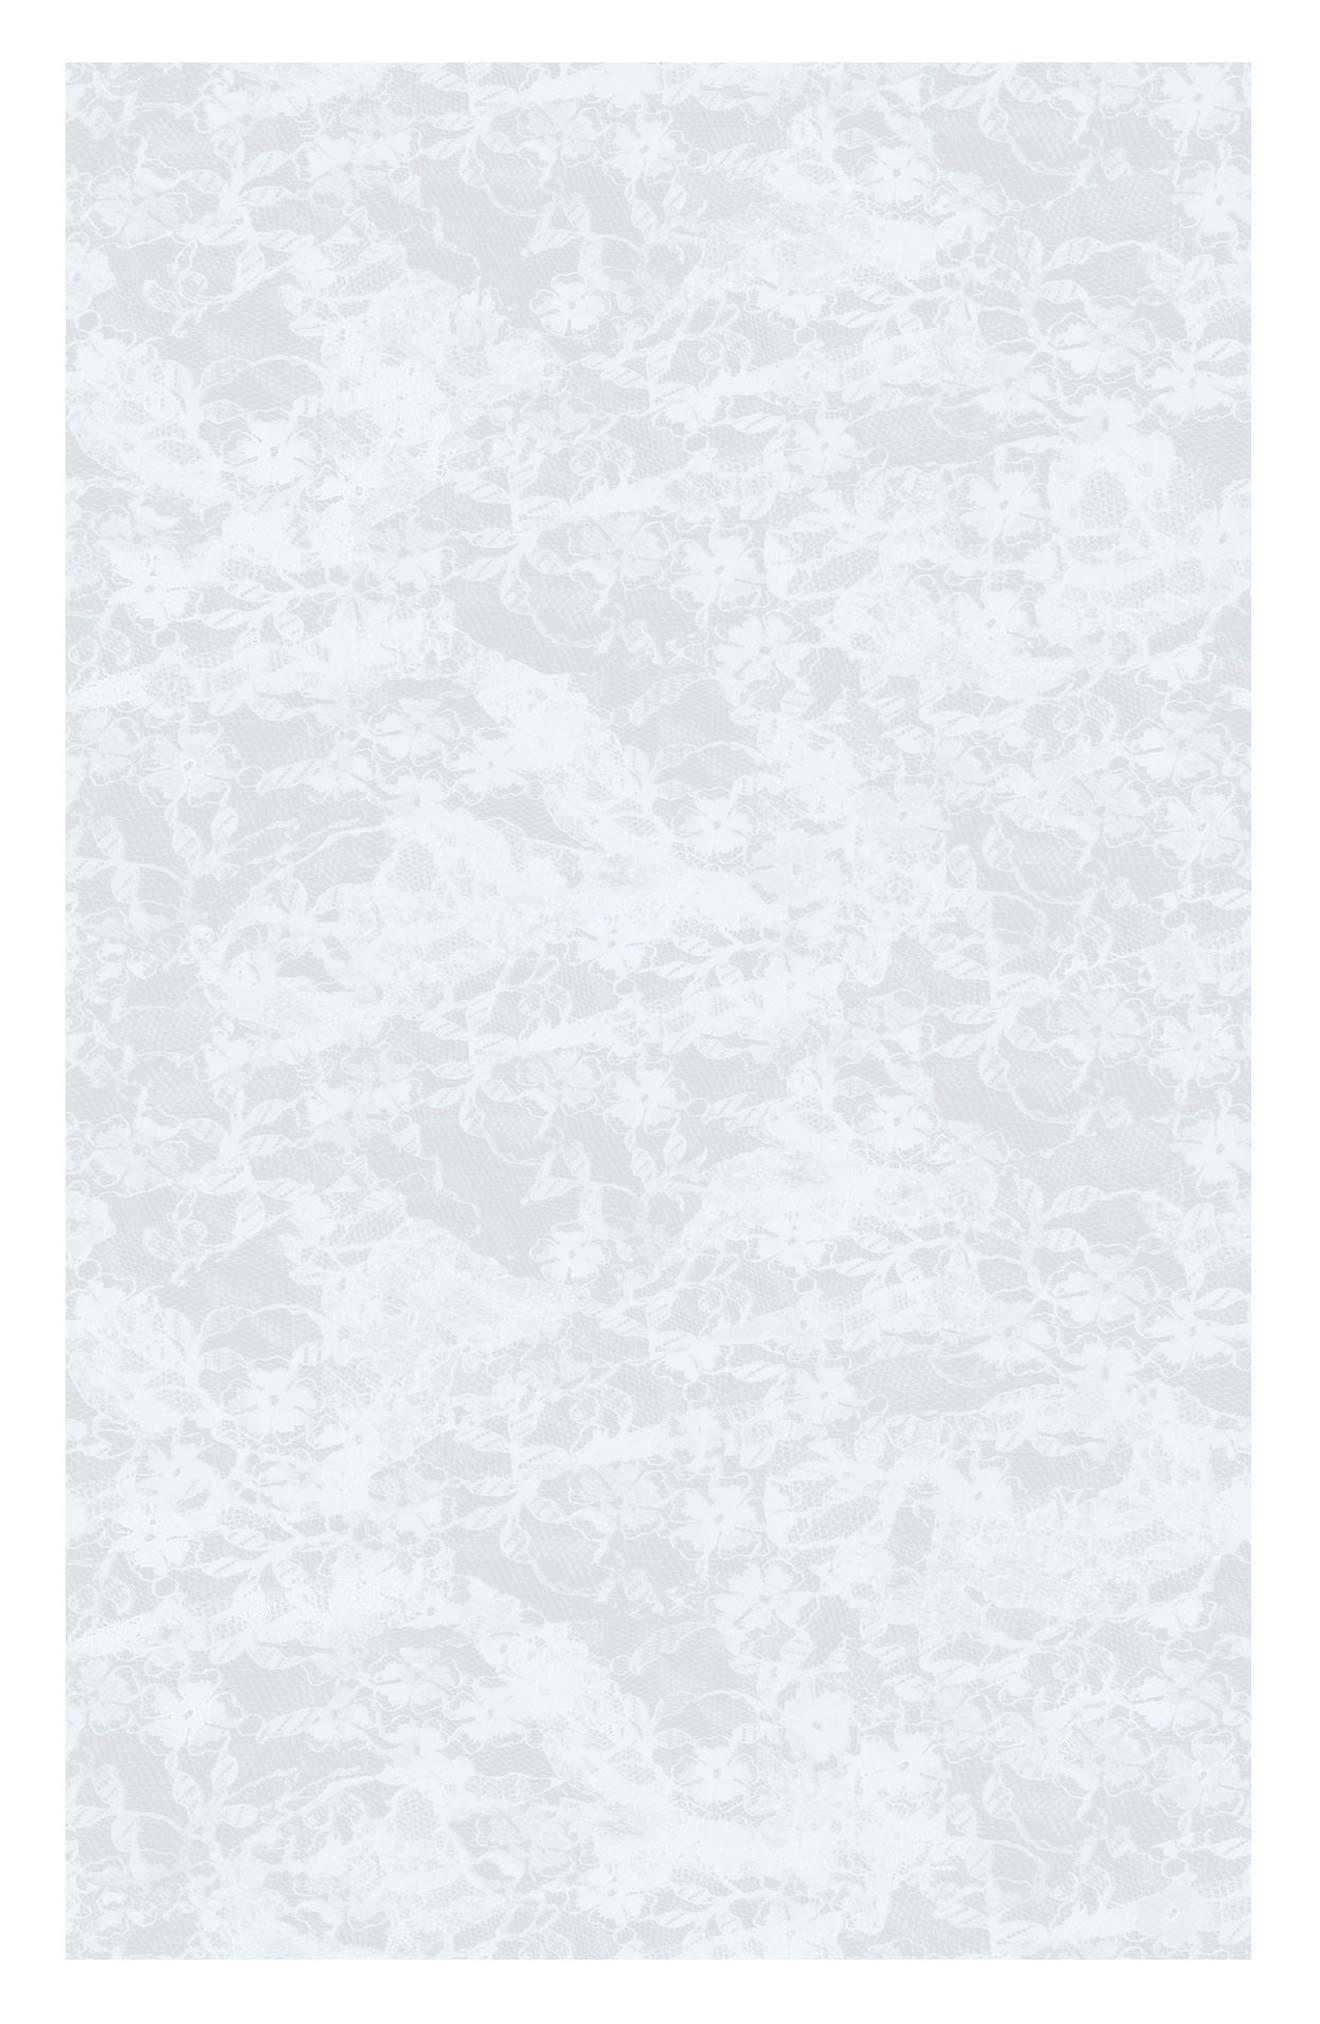 Main Image - Wallpops Lace  Peel & Stick Vinyl Window Cling